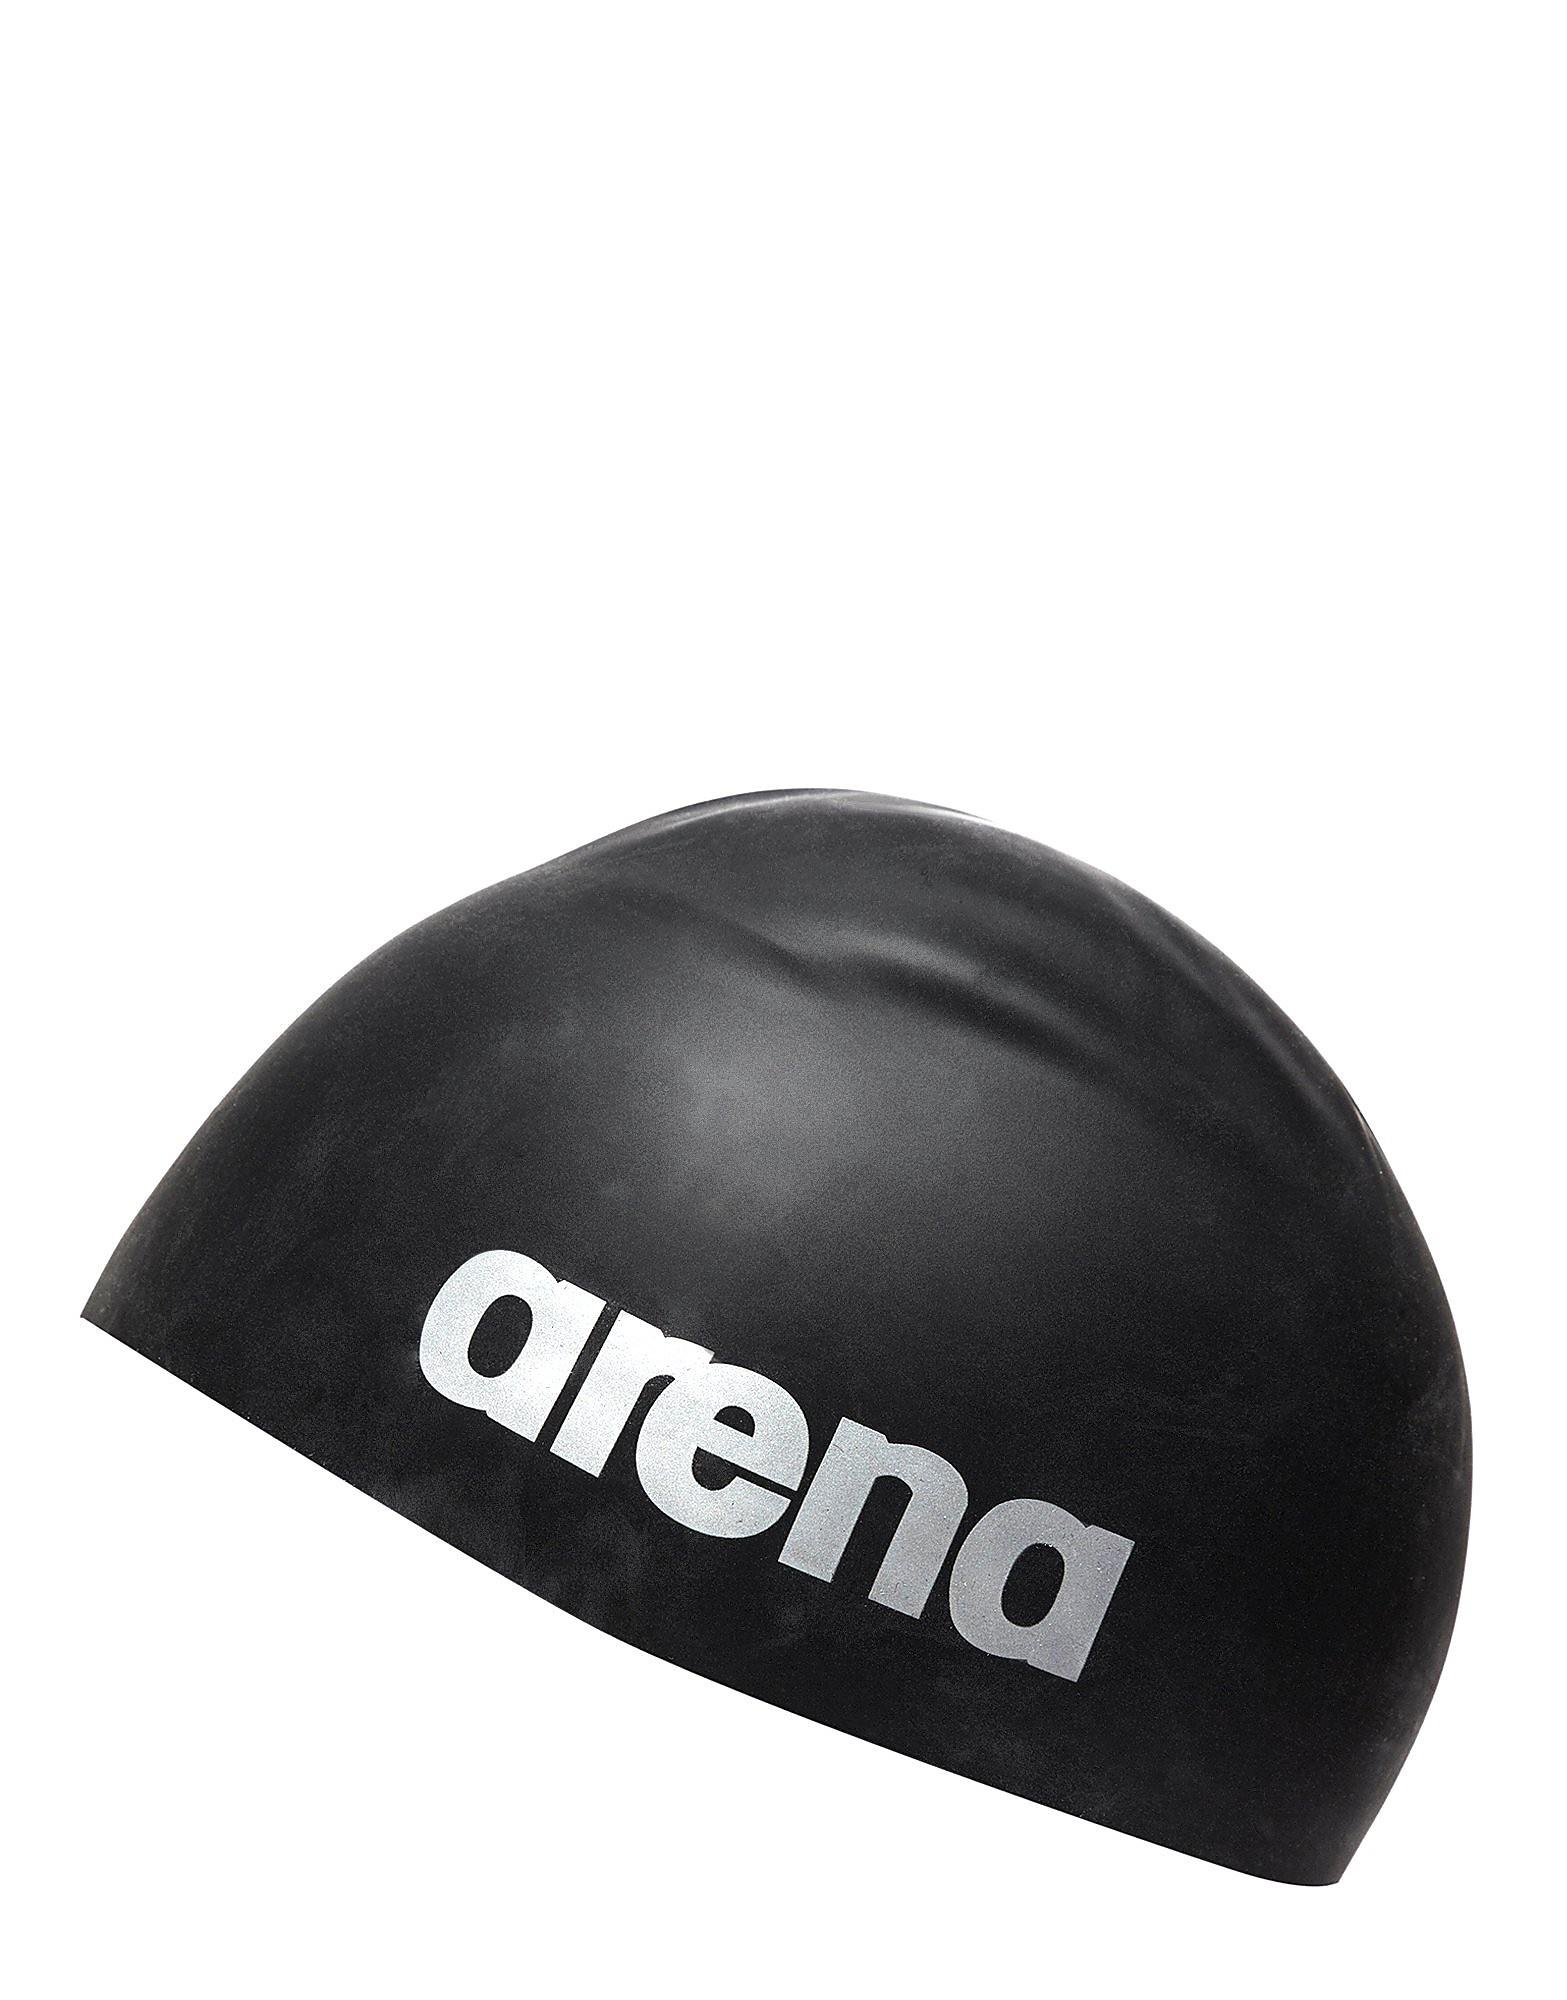 Arena 3D Race Swimming Cap